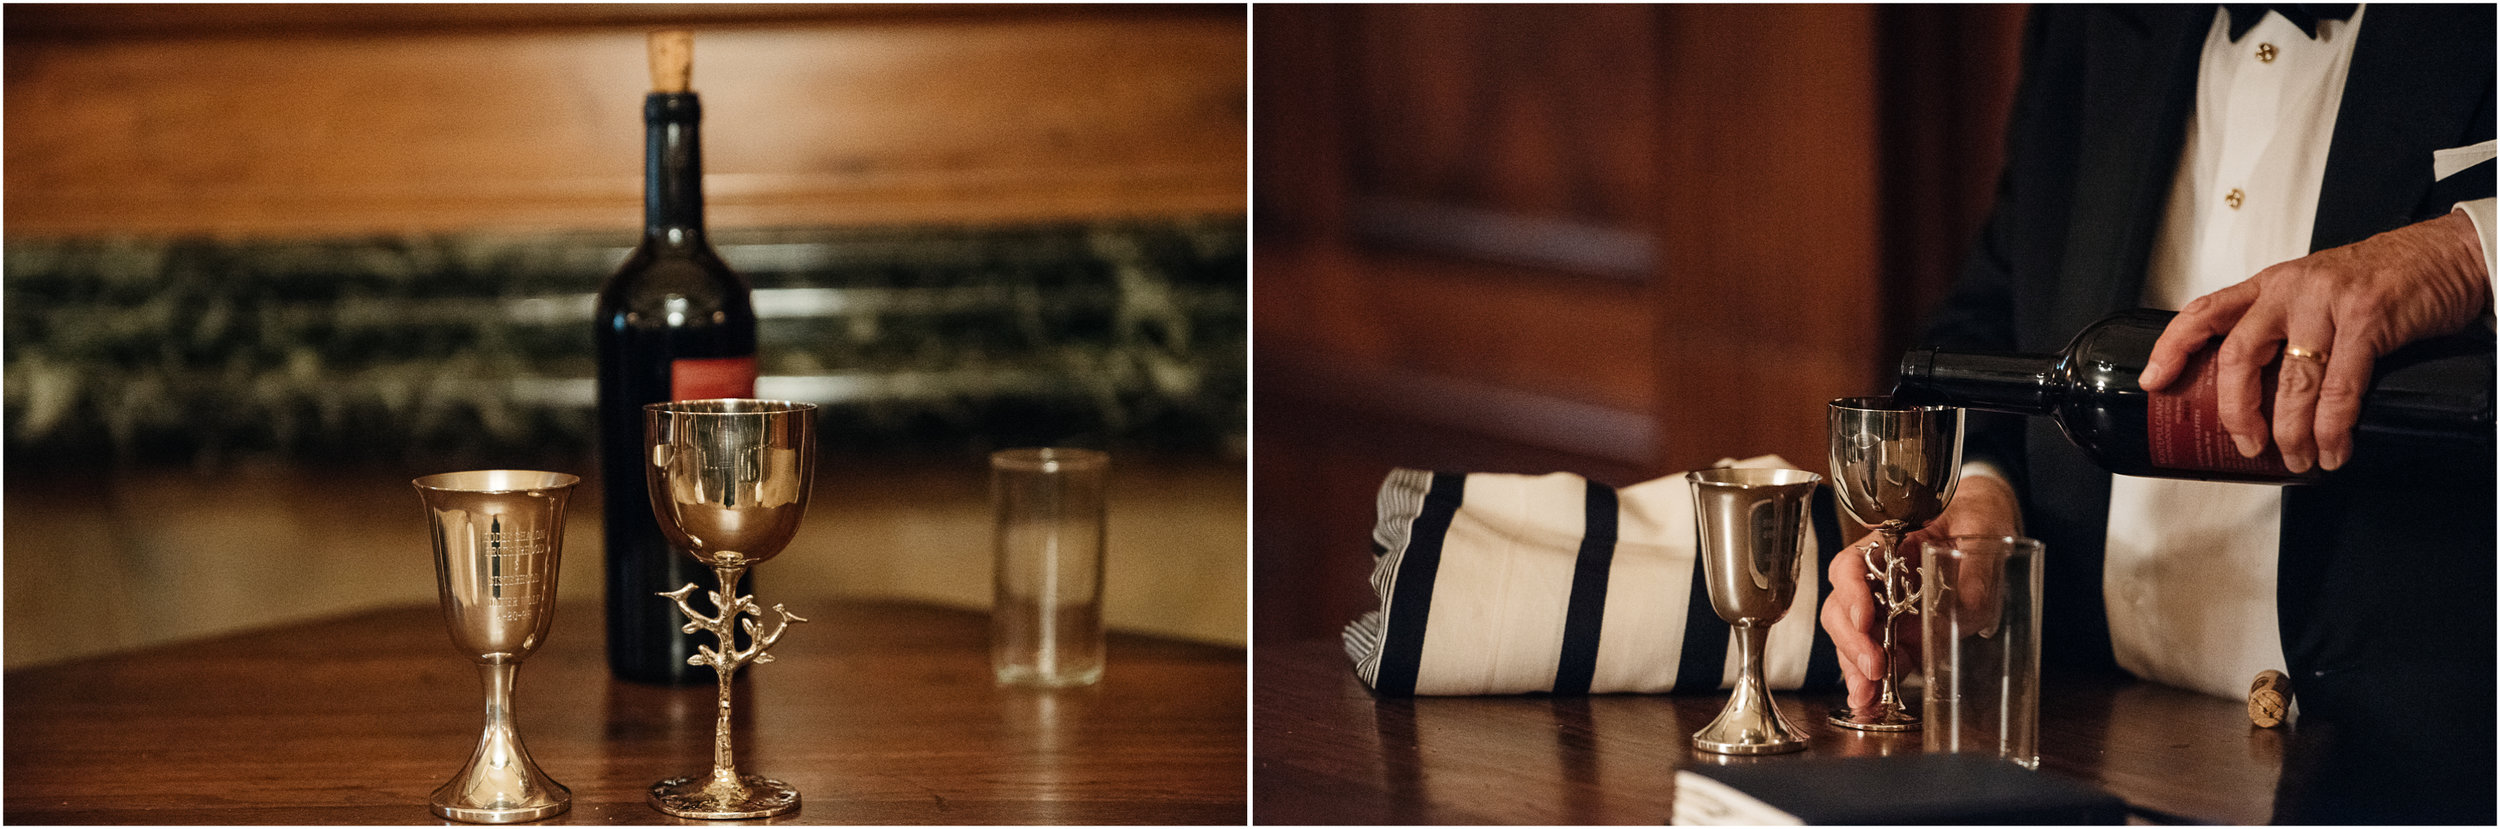 wine pouring, jewish wedding ceremony pittsburgh pa.jpg